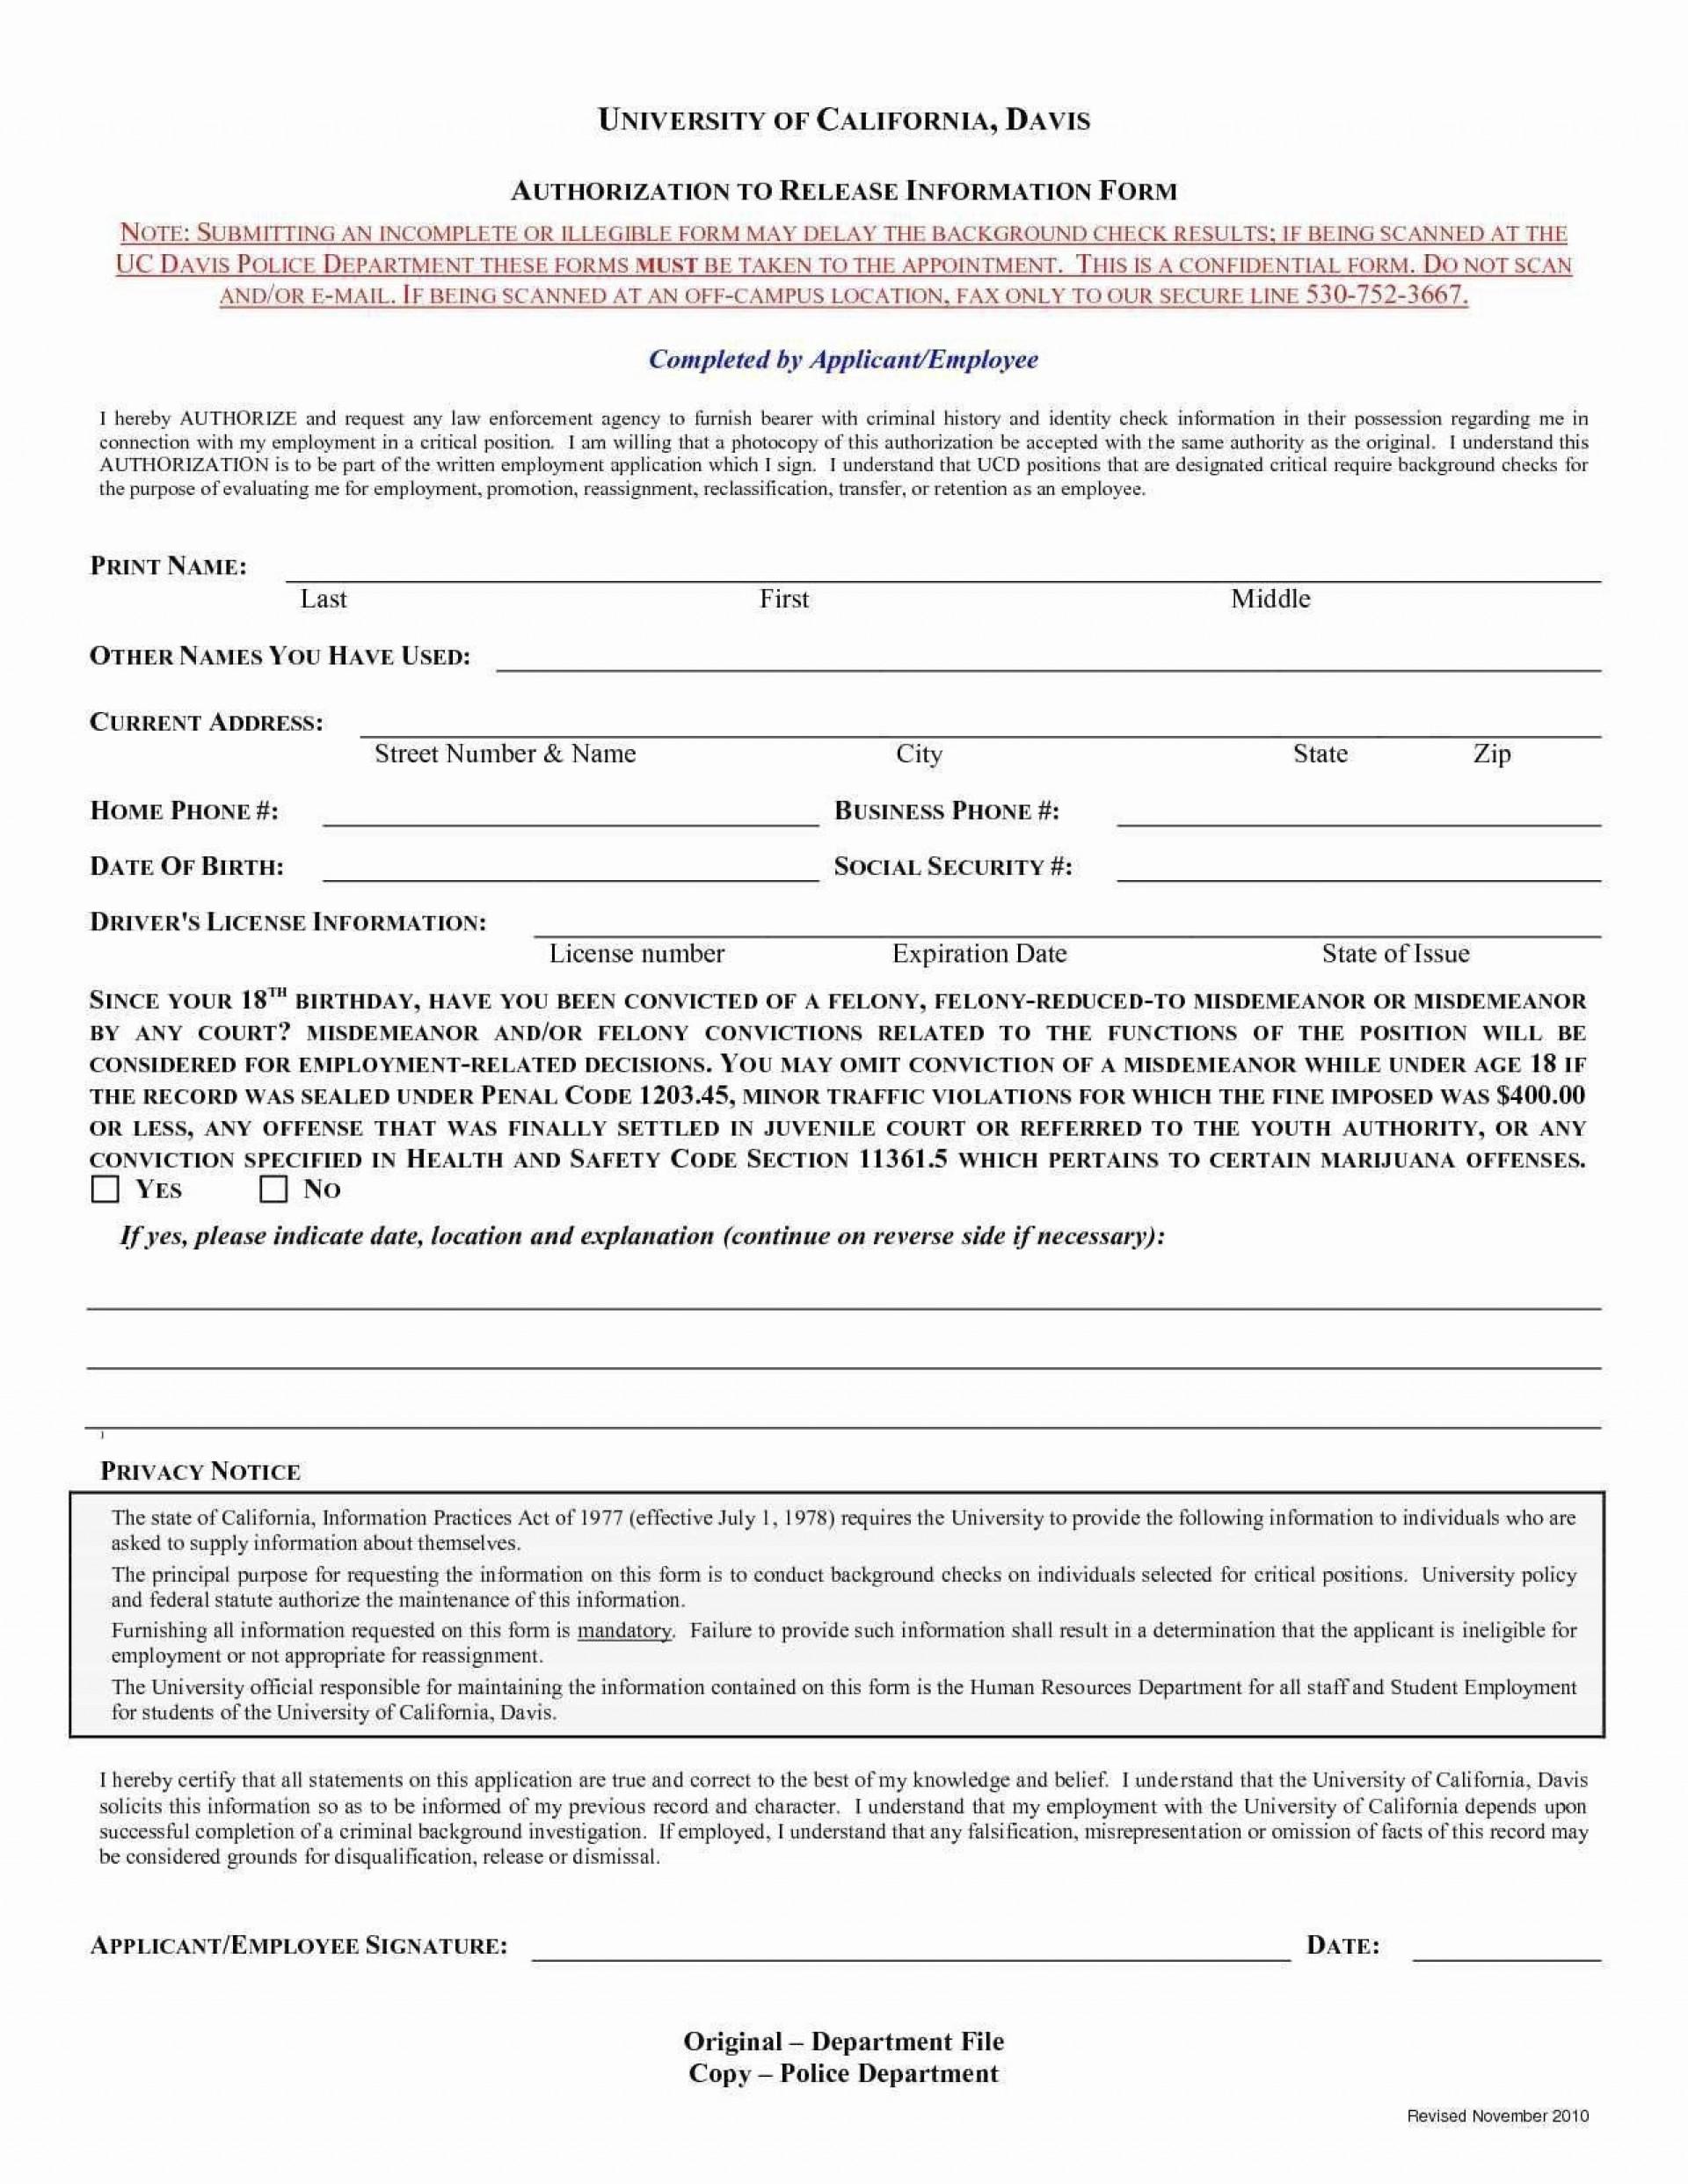 006 Sensational Background Check Form Template Free Concept  Authorization1920